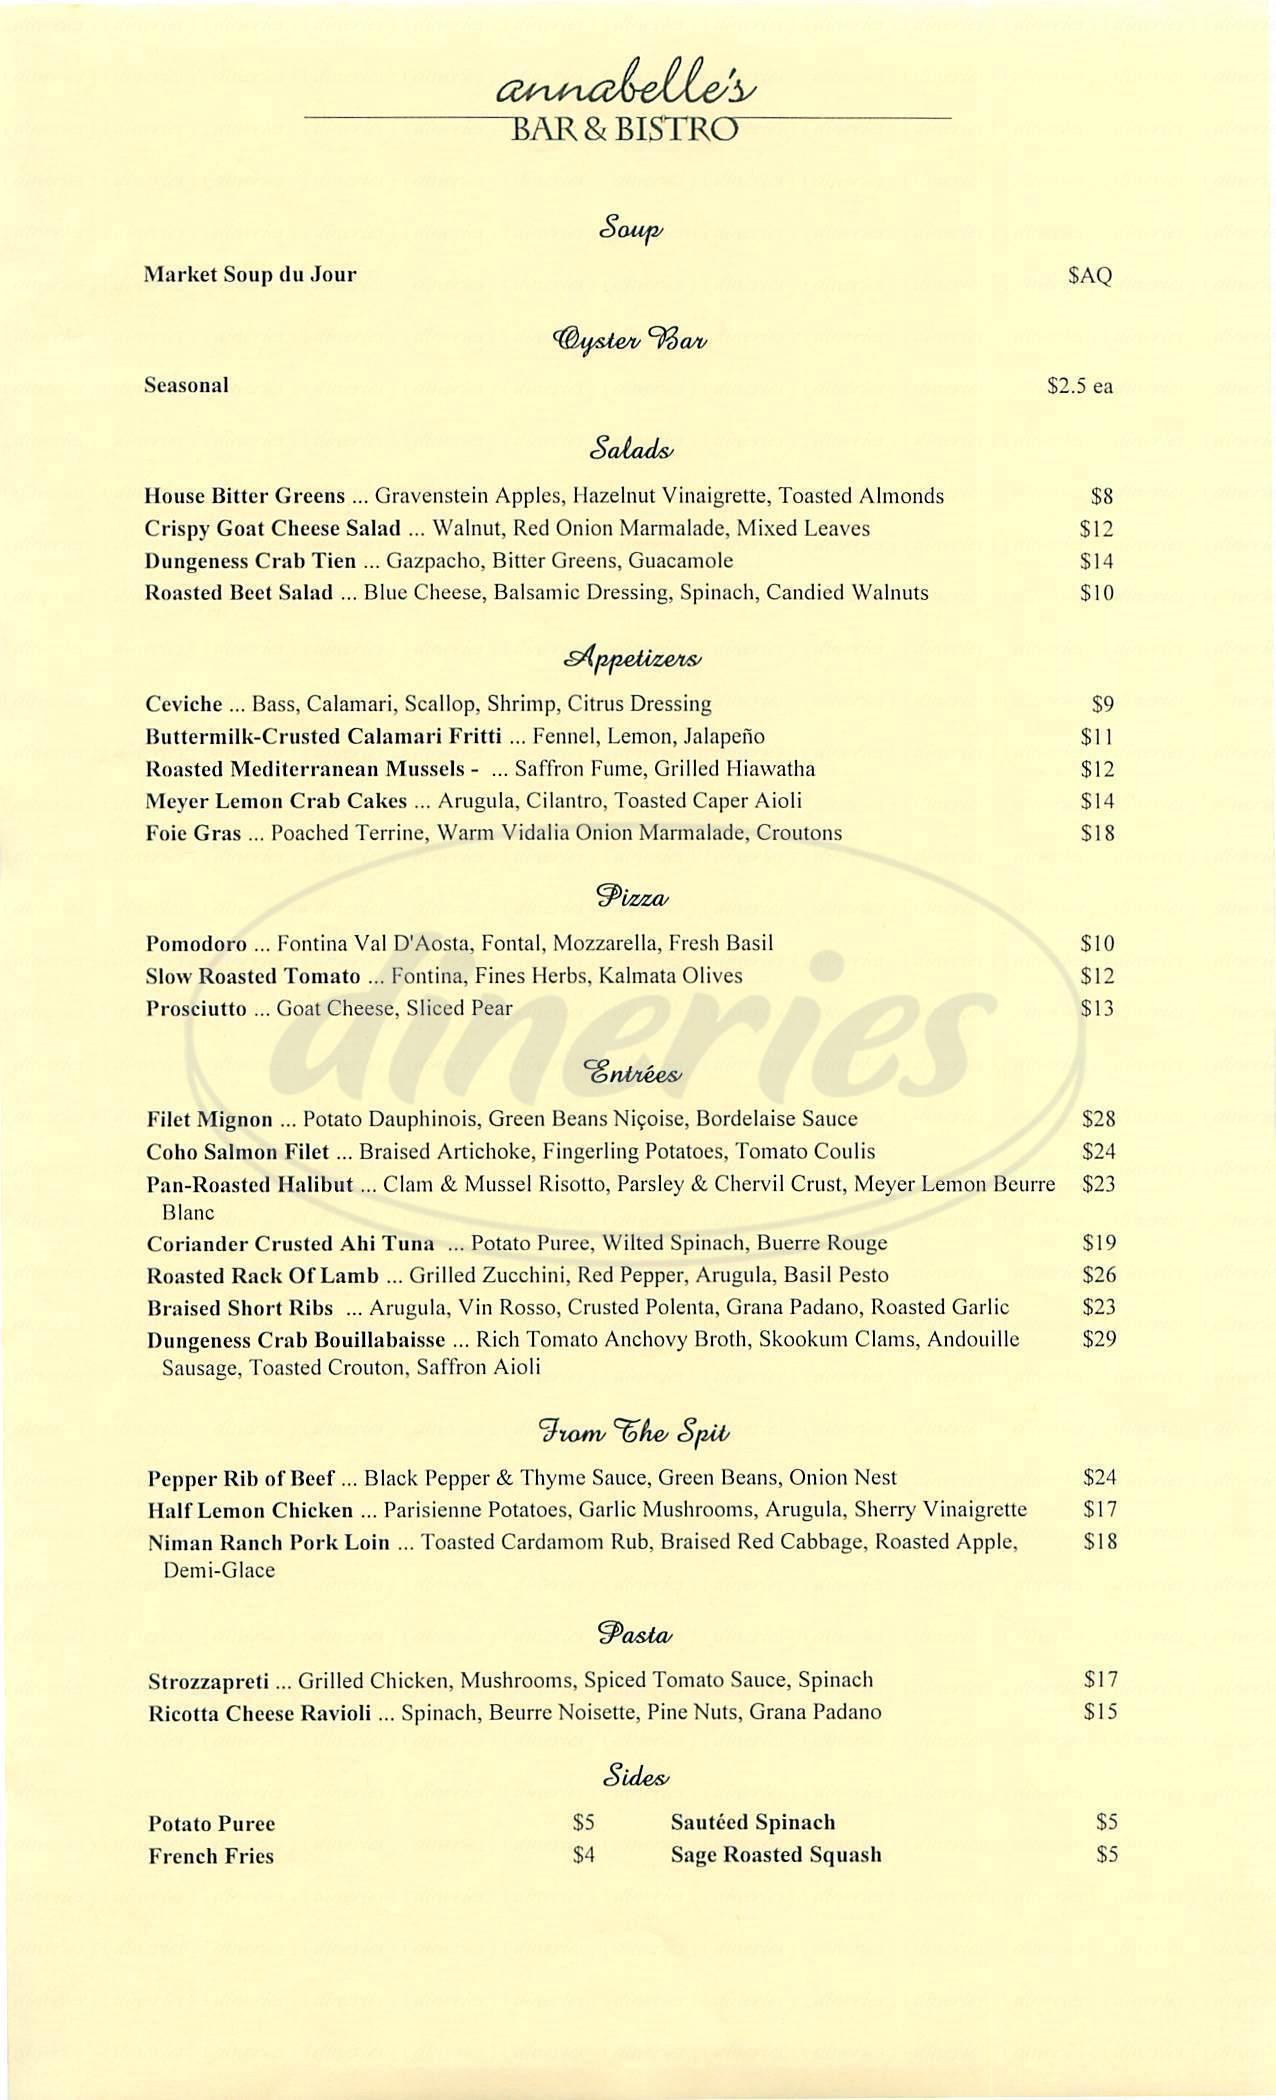 menu for Annabelles Bar & Bistro